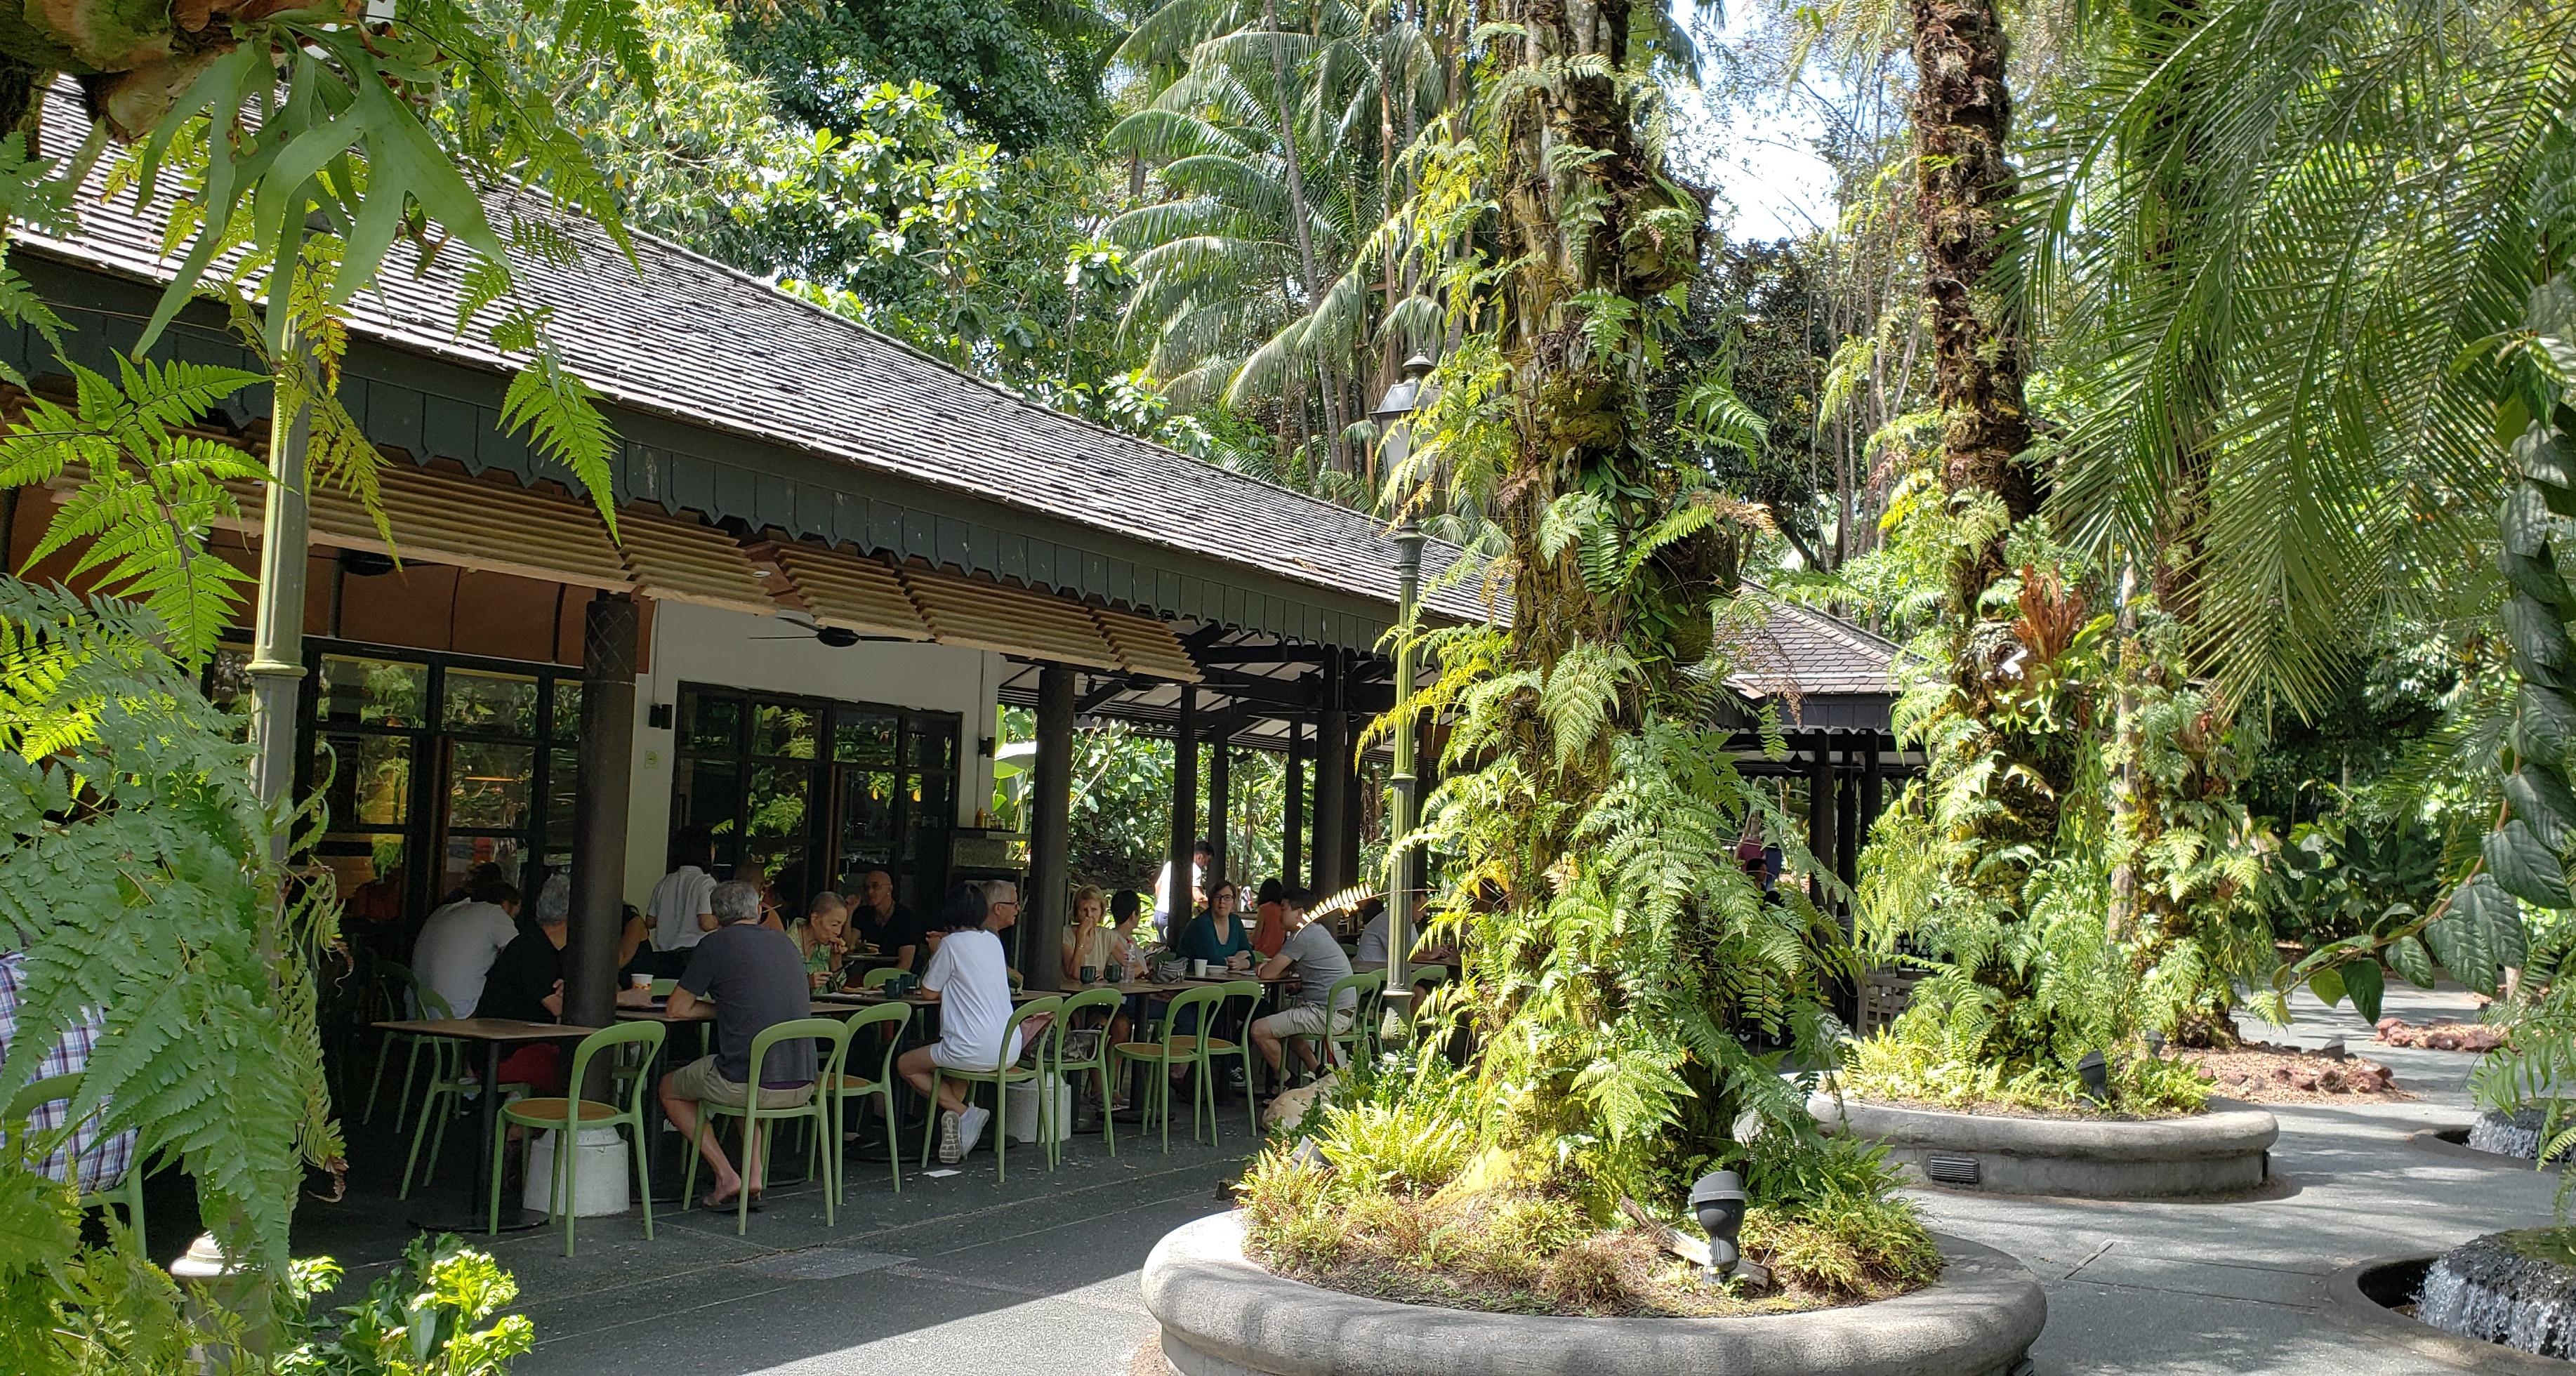 Casa Verde eatery at Singapore Botanic Gardens